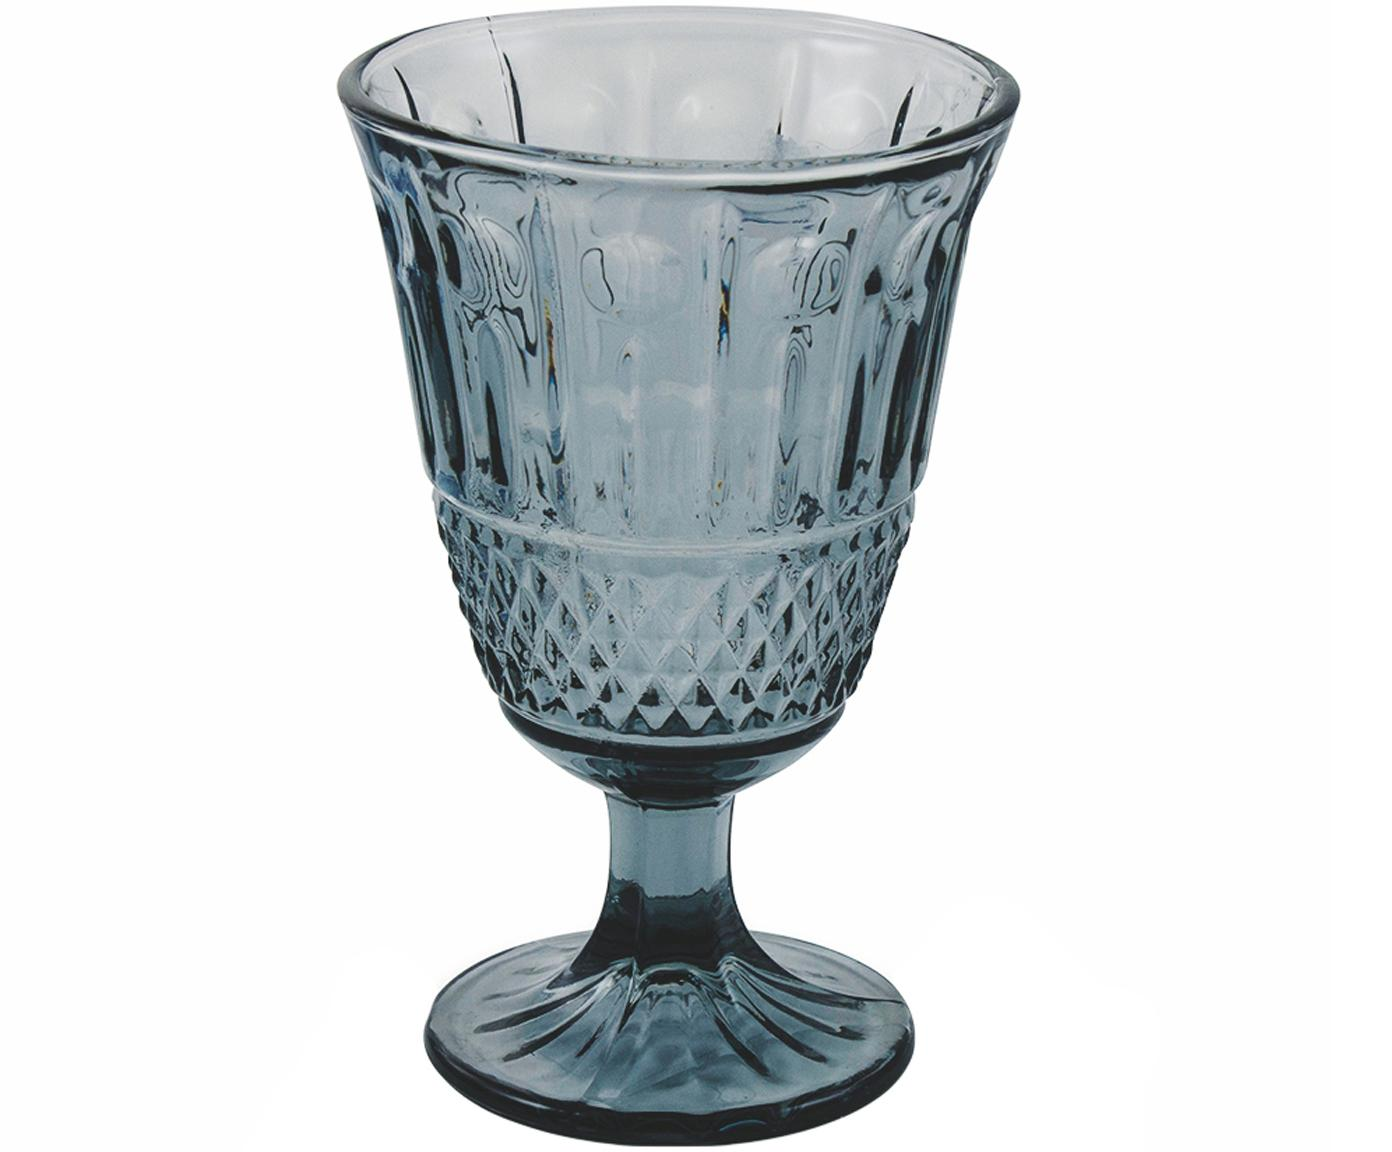 Weingläser Elegance in Blau, 6er-Set, Glas, Blau, Ø 9 x H 14 cm